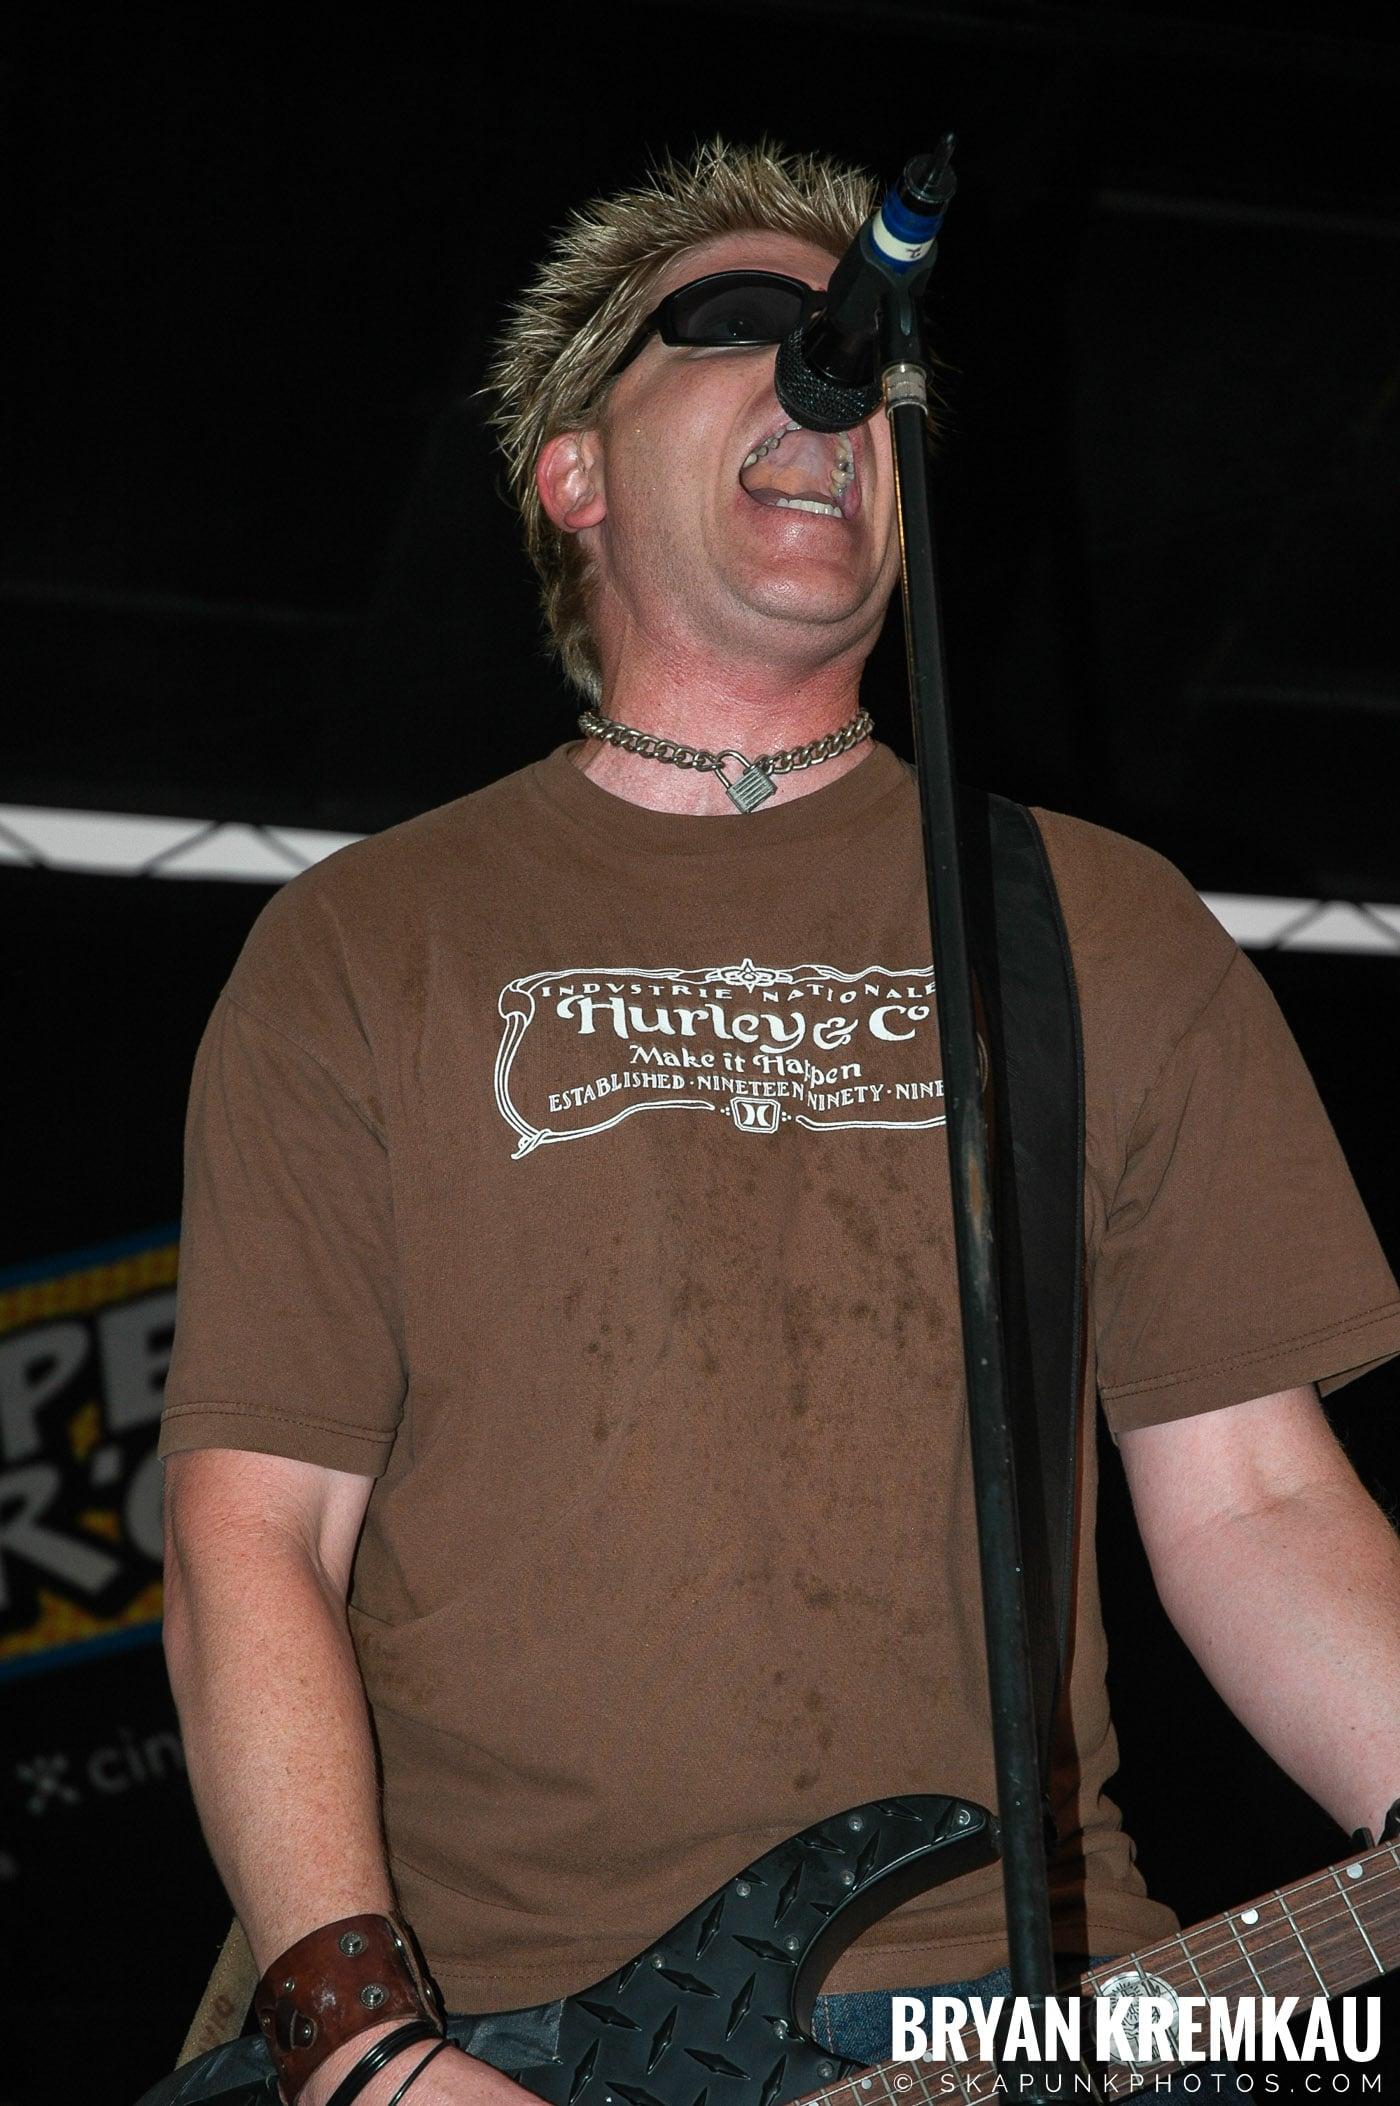 The Offspring @ Warped Tour 05, NYC - 8.12.05 (5)